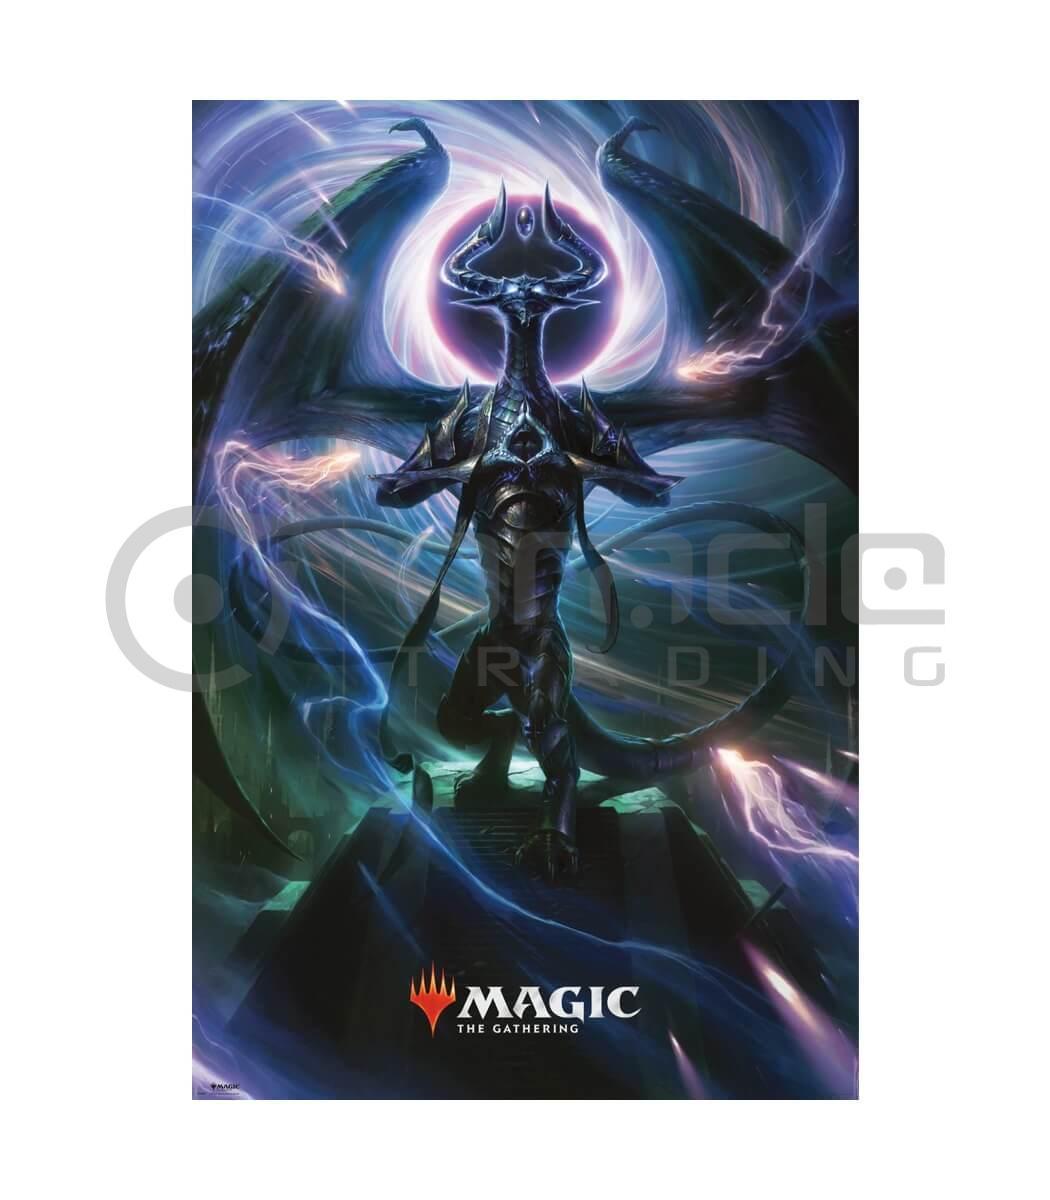 Magic the Gathering Poster - Nicol Bolas